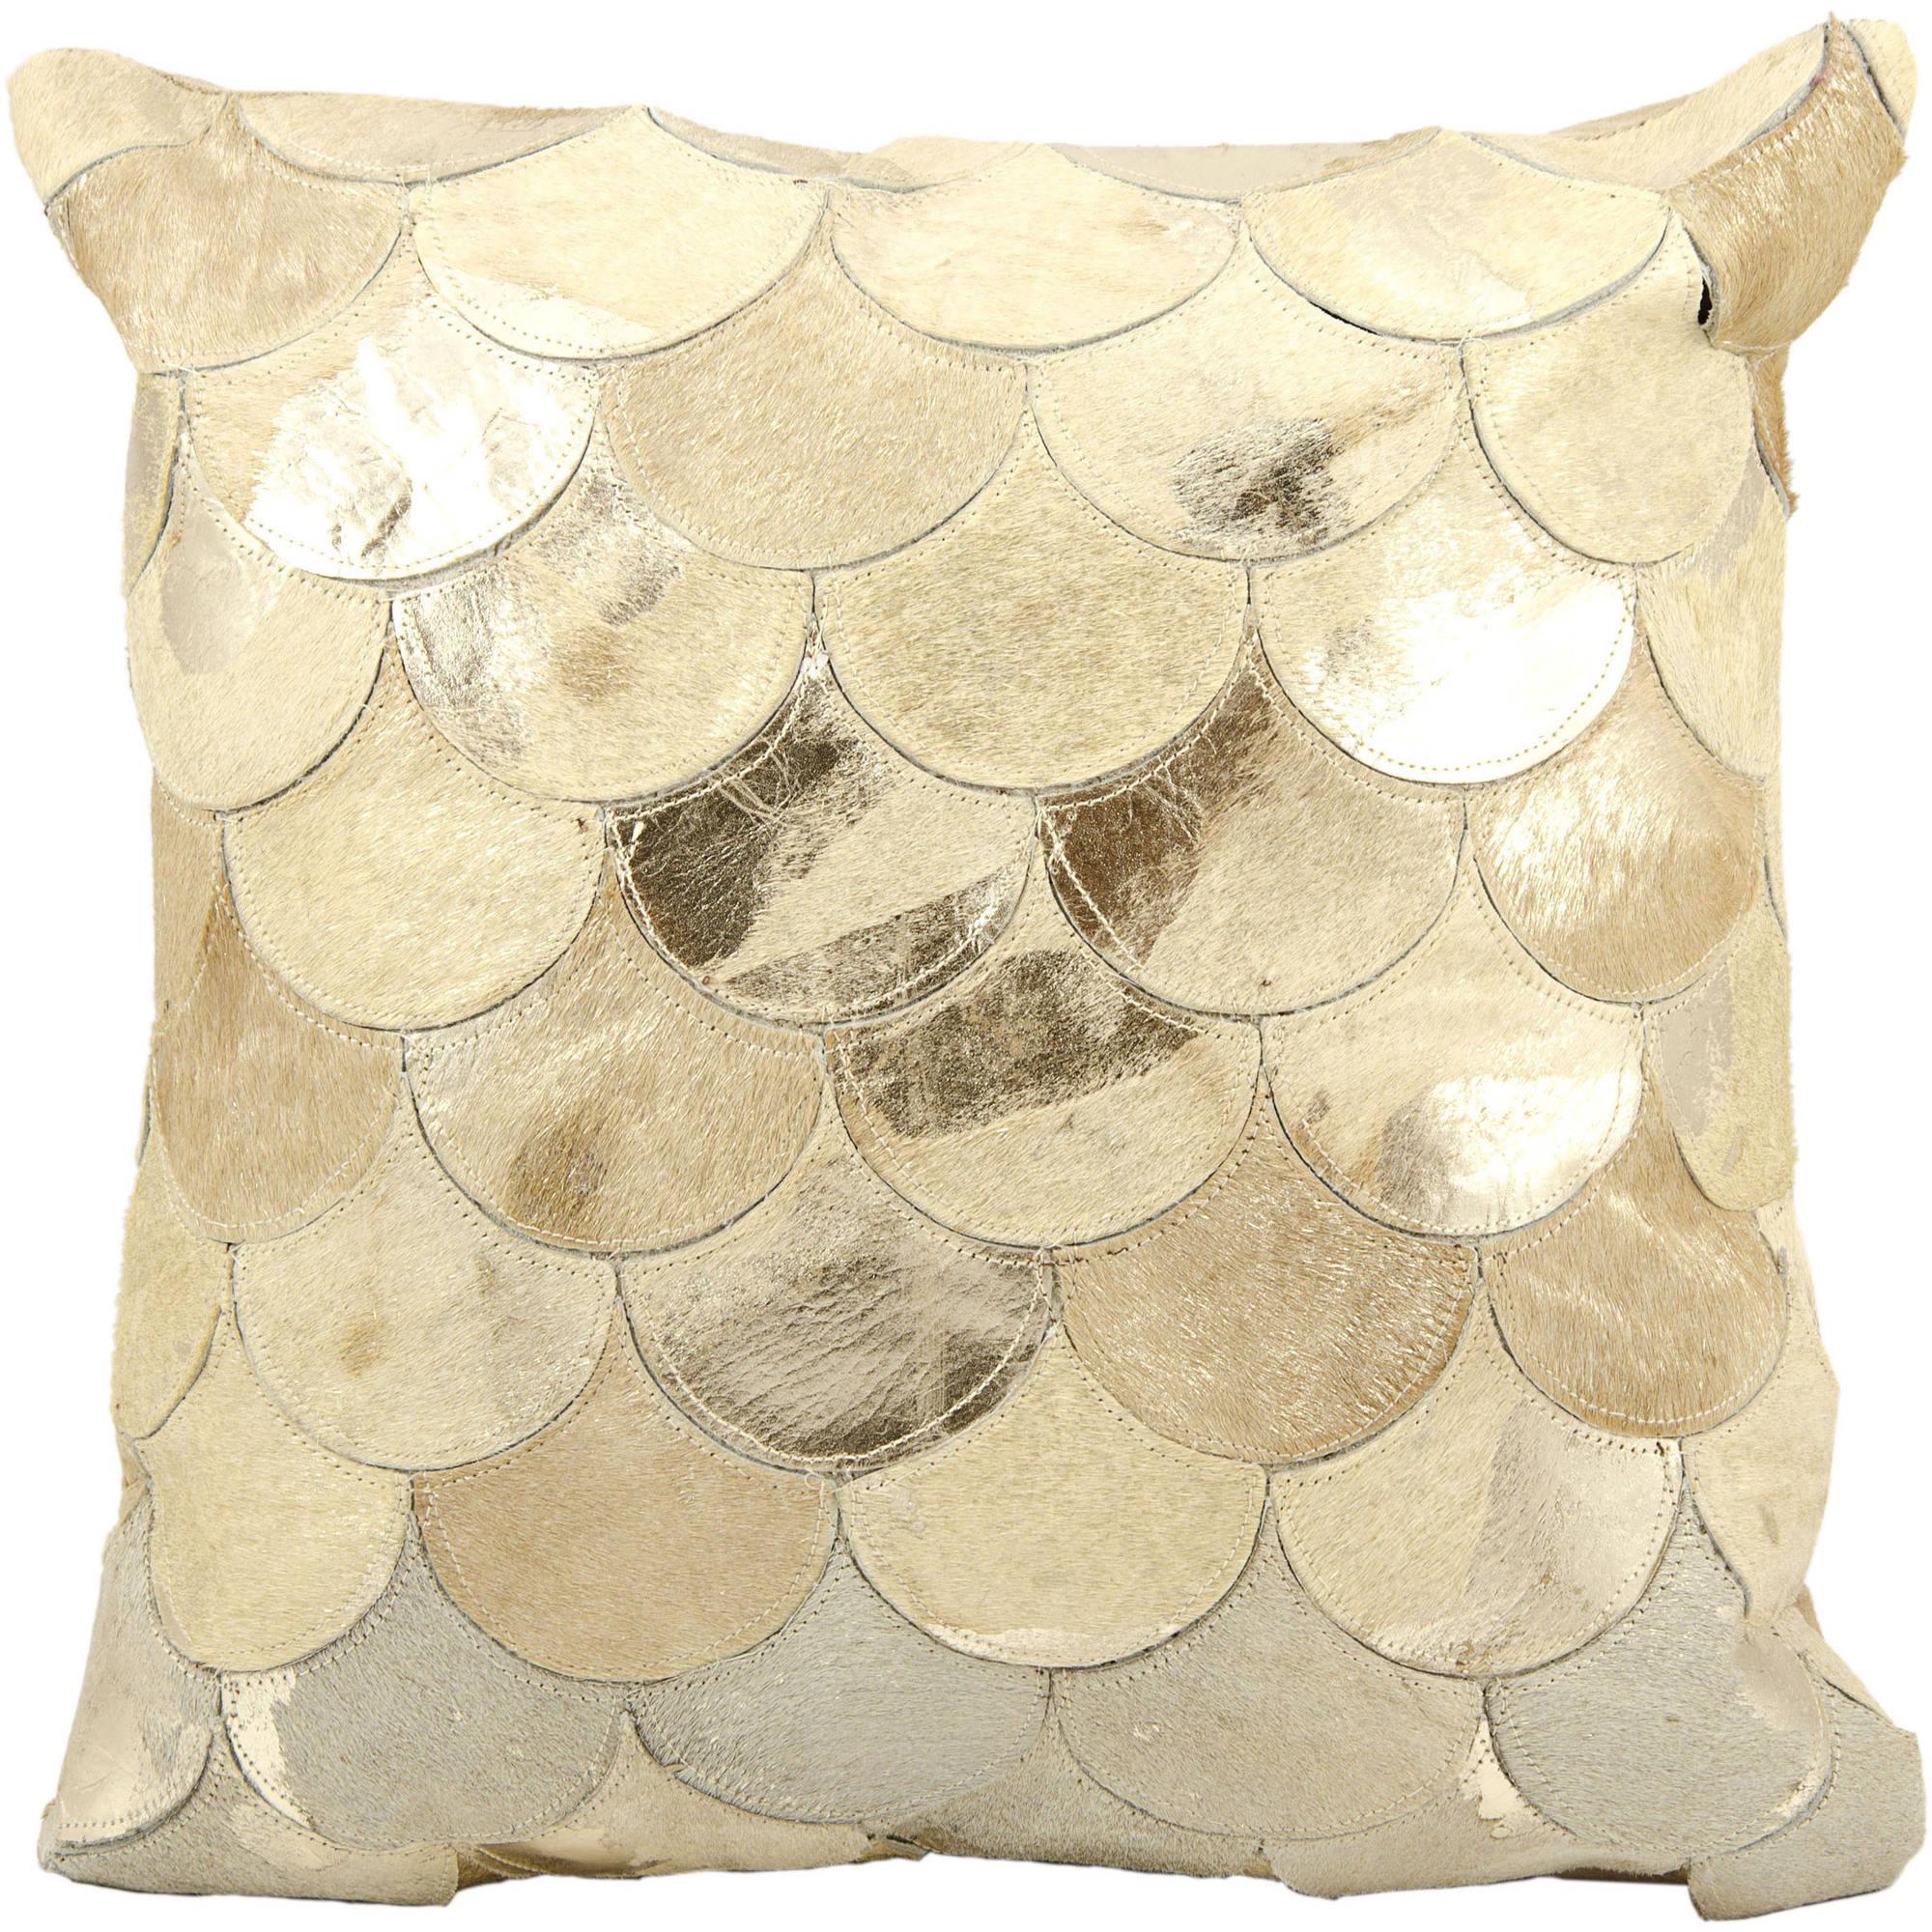 Nourison Natural Leather Hide Metalic Balloons Decorative Pillow